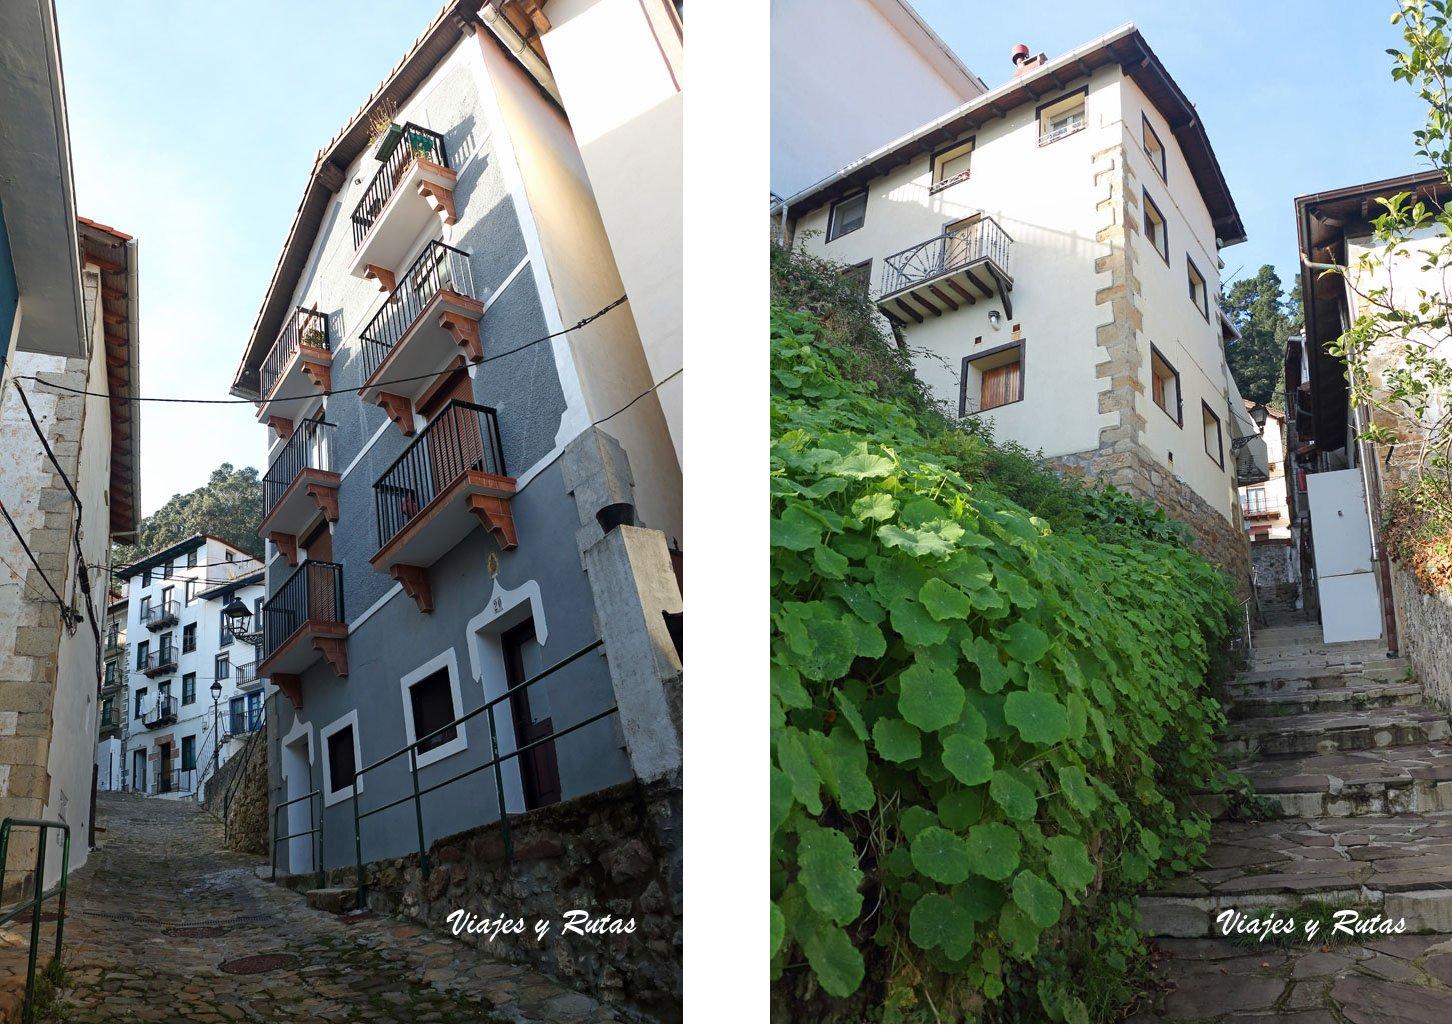 Calles de Elantxobe, Bizkaia